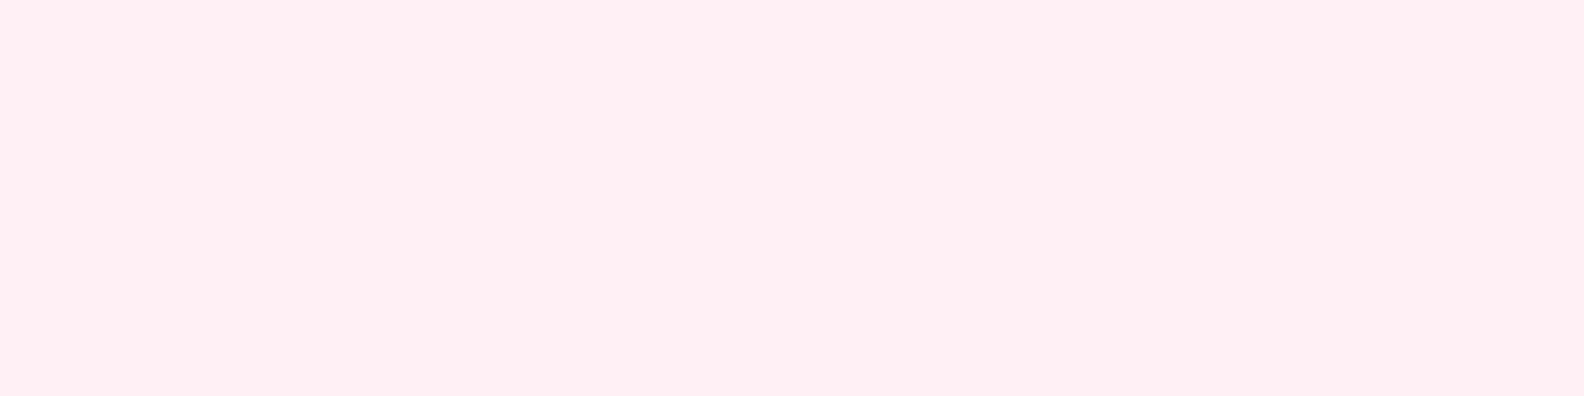 1584x396 Lavender Blush Solid Color Background